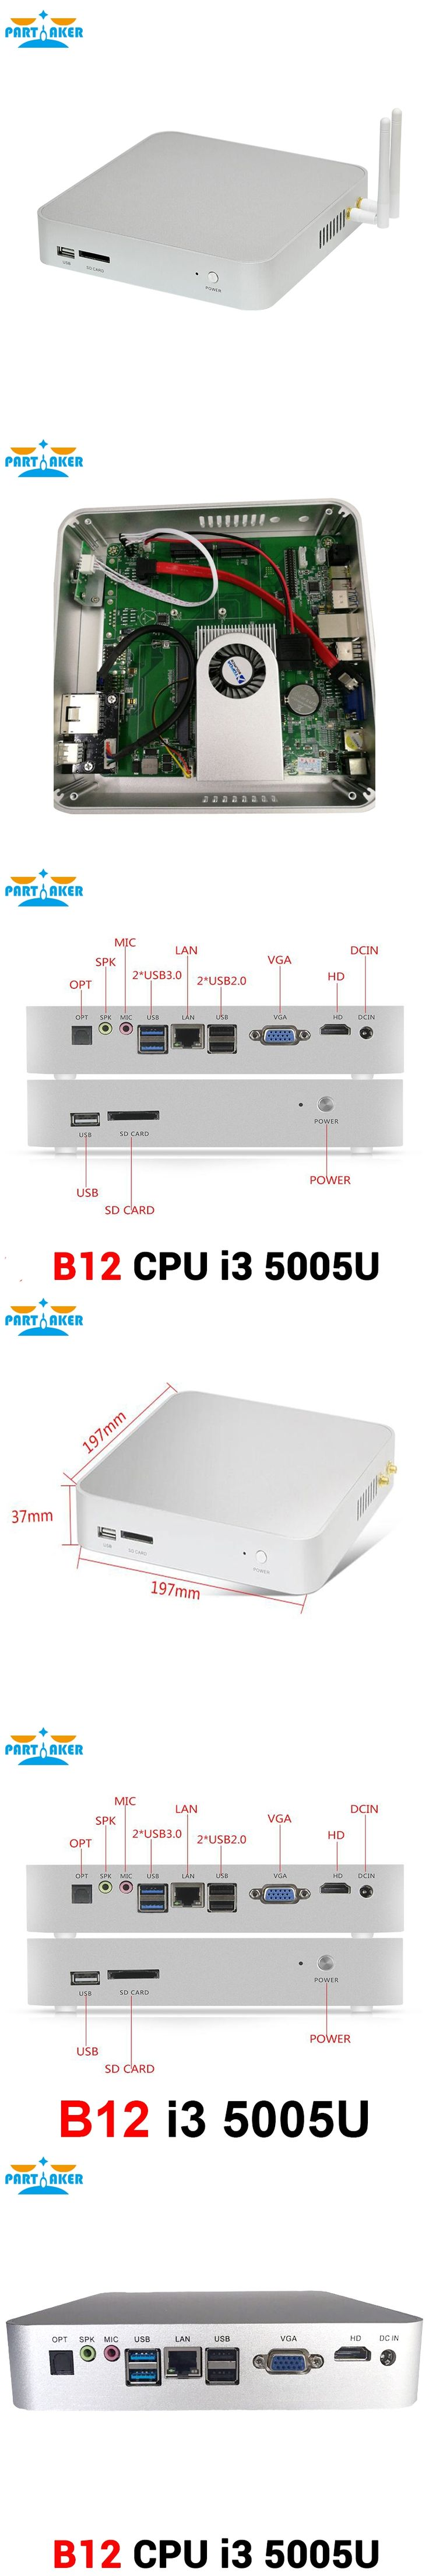 Groß Lustiges Computer Kabel Diagramm Galerie - Schaltplan Serie ...